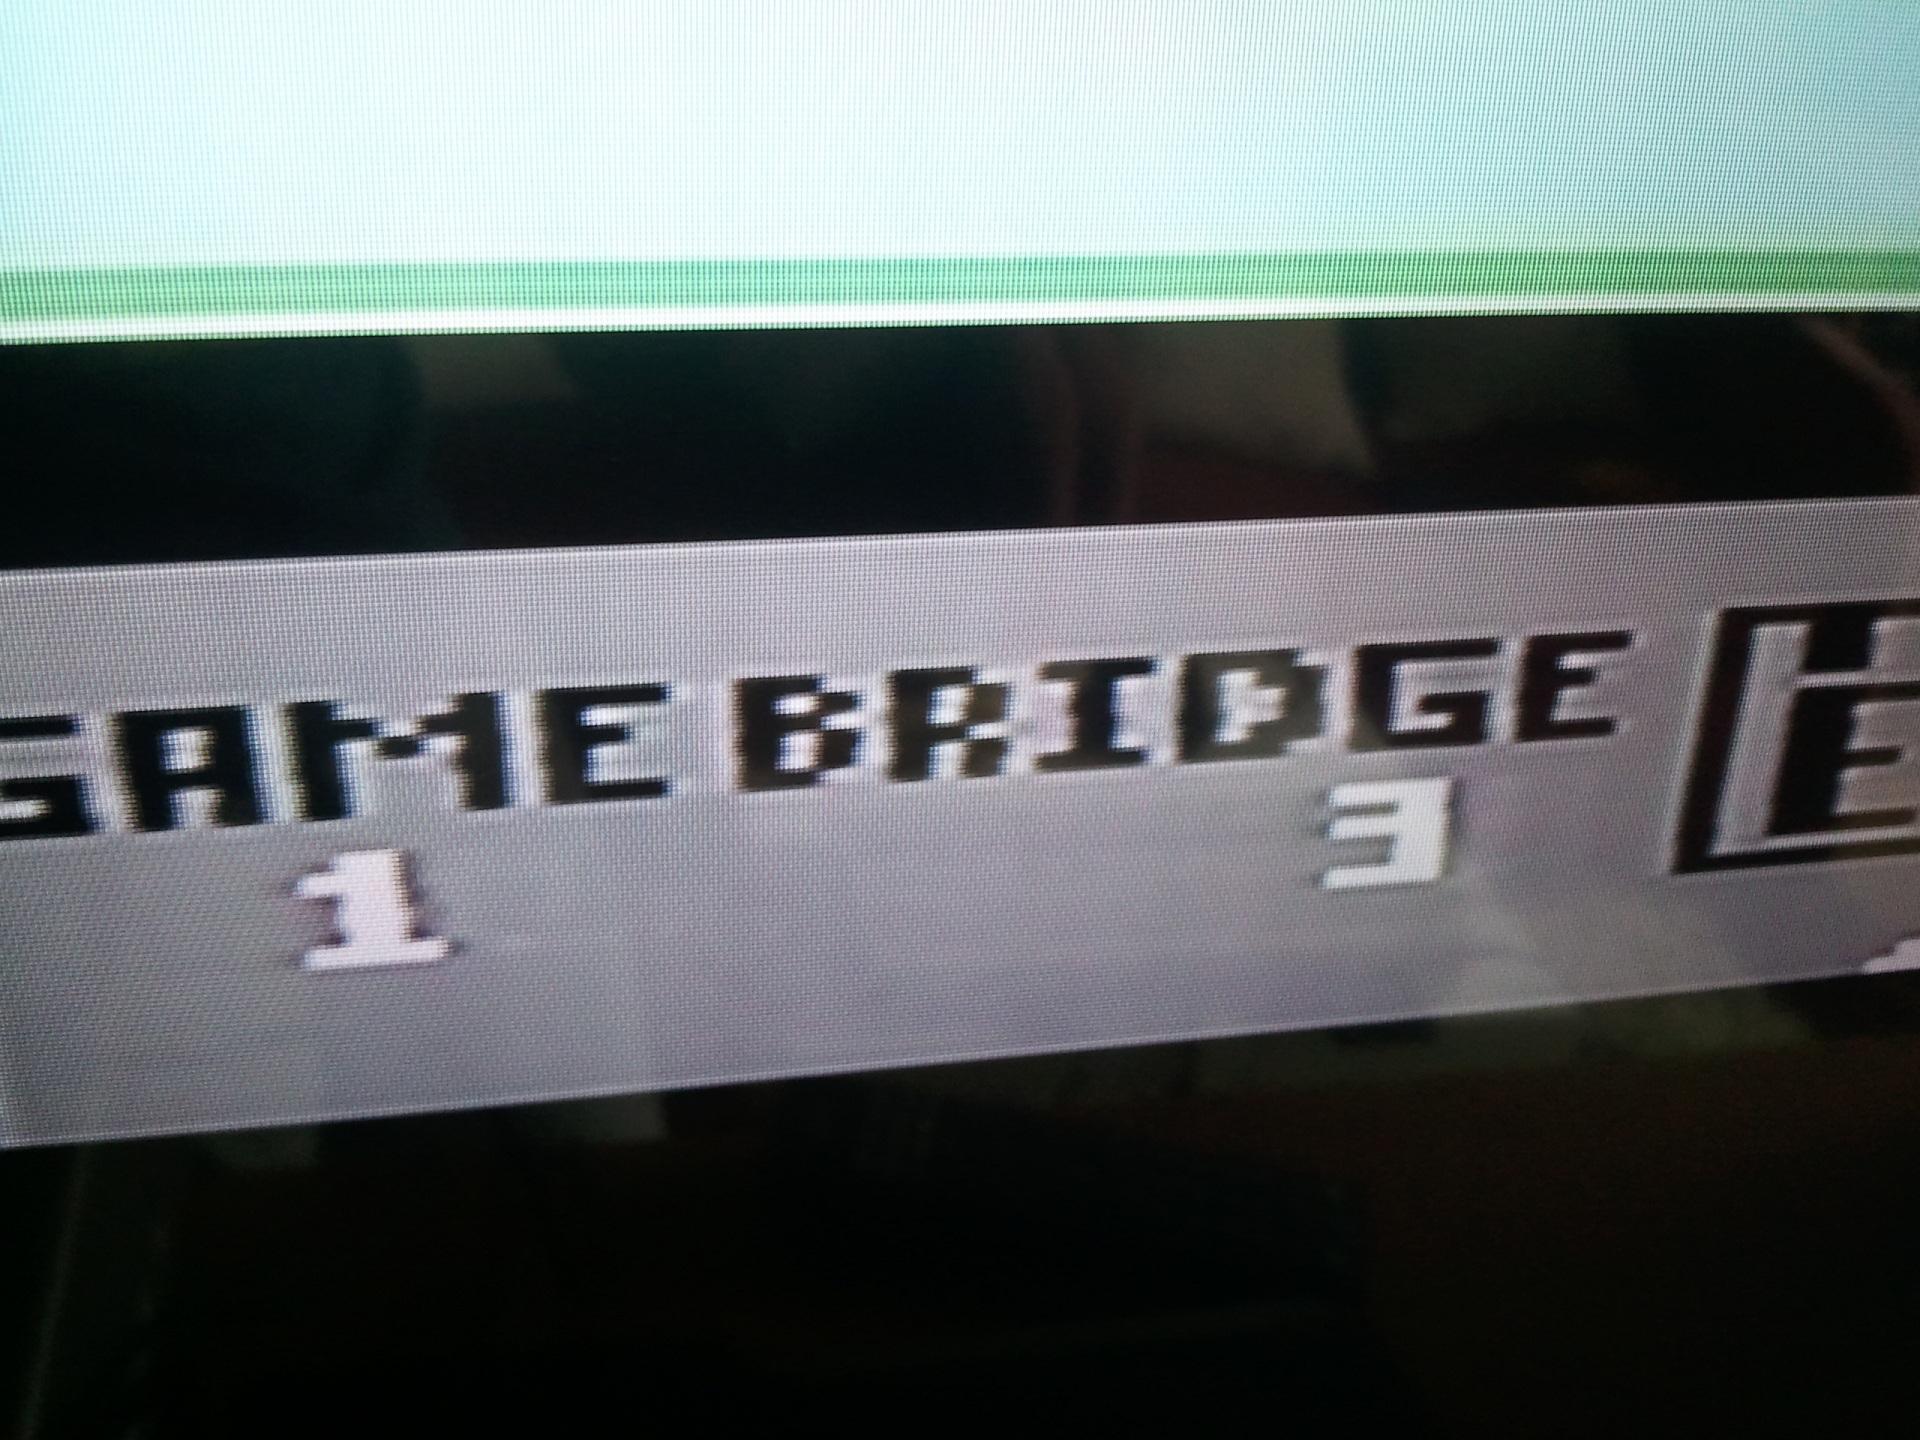 Obraz z Commodore 64 po kablu EURO/SCART